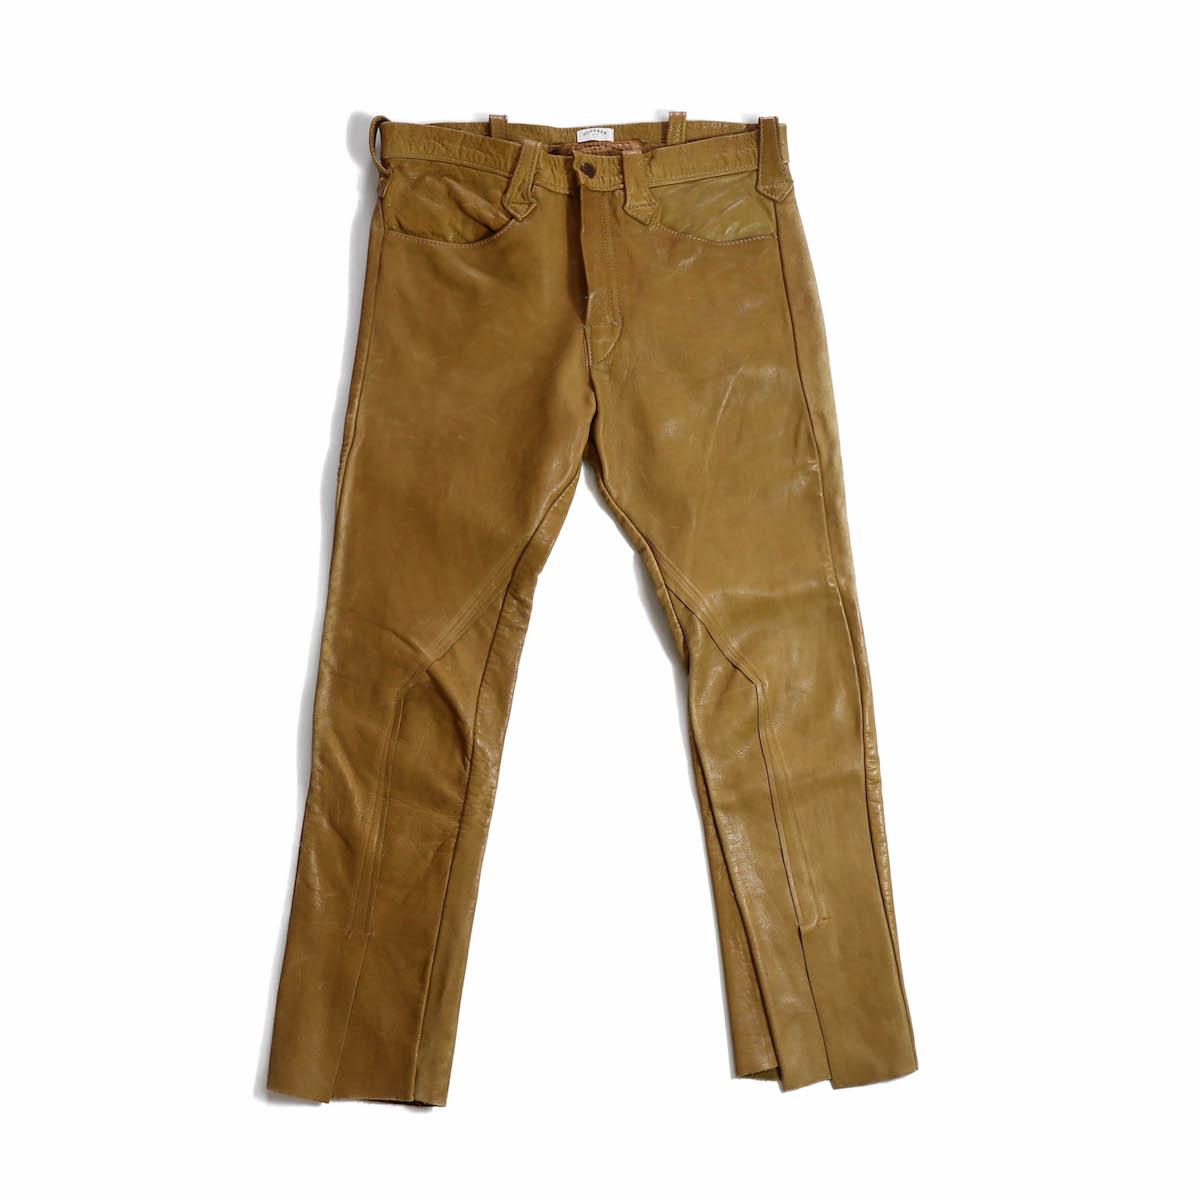 OLD PARK / SLIT PANTS -EAST WEST